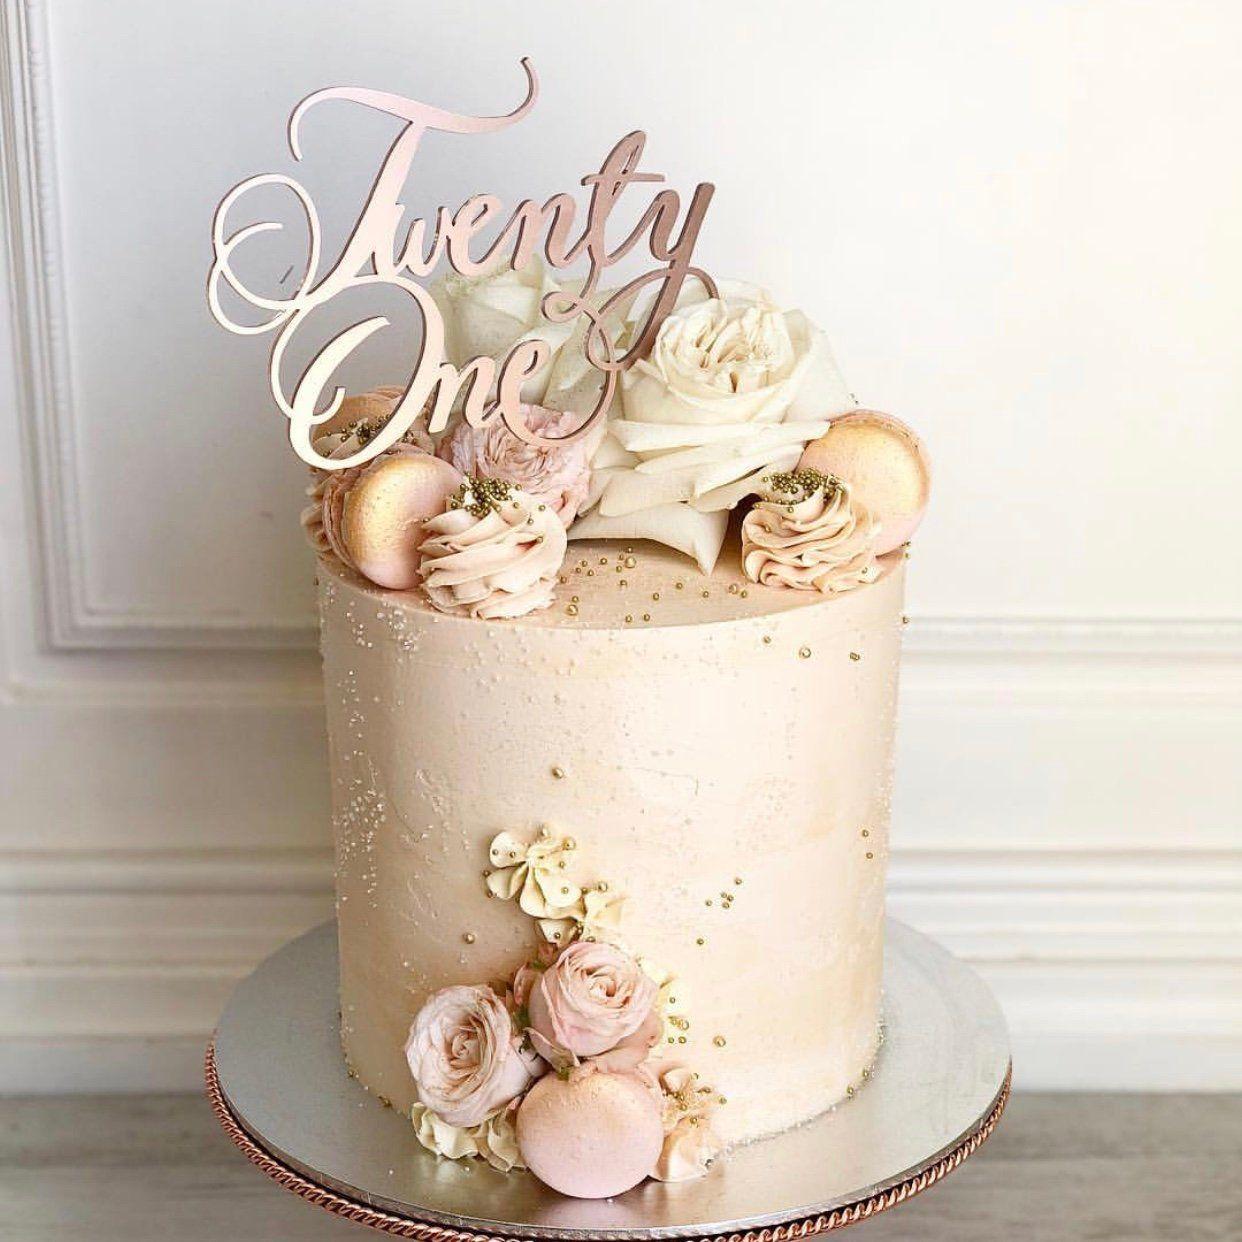 Twenty One cake topper - - Custom cake topper - Birthday decor- Twenty One birthday Cake topper - Cake decoration #21stbirthdaydecorations